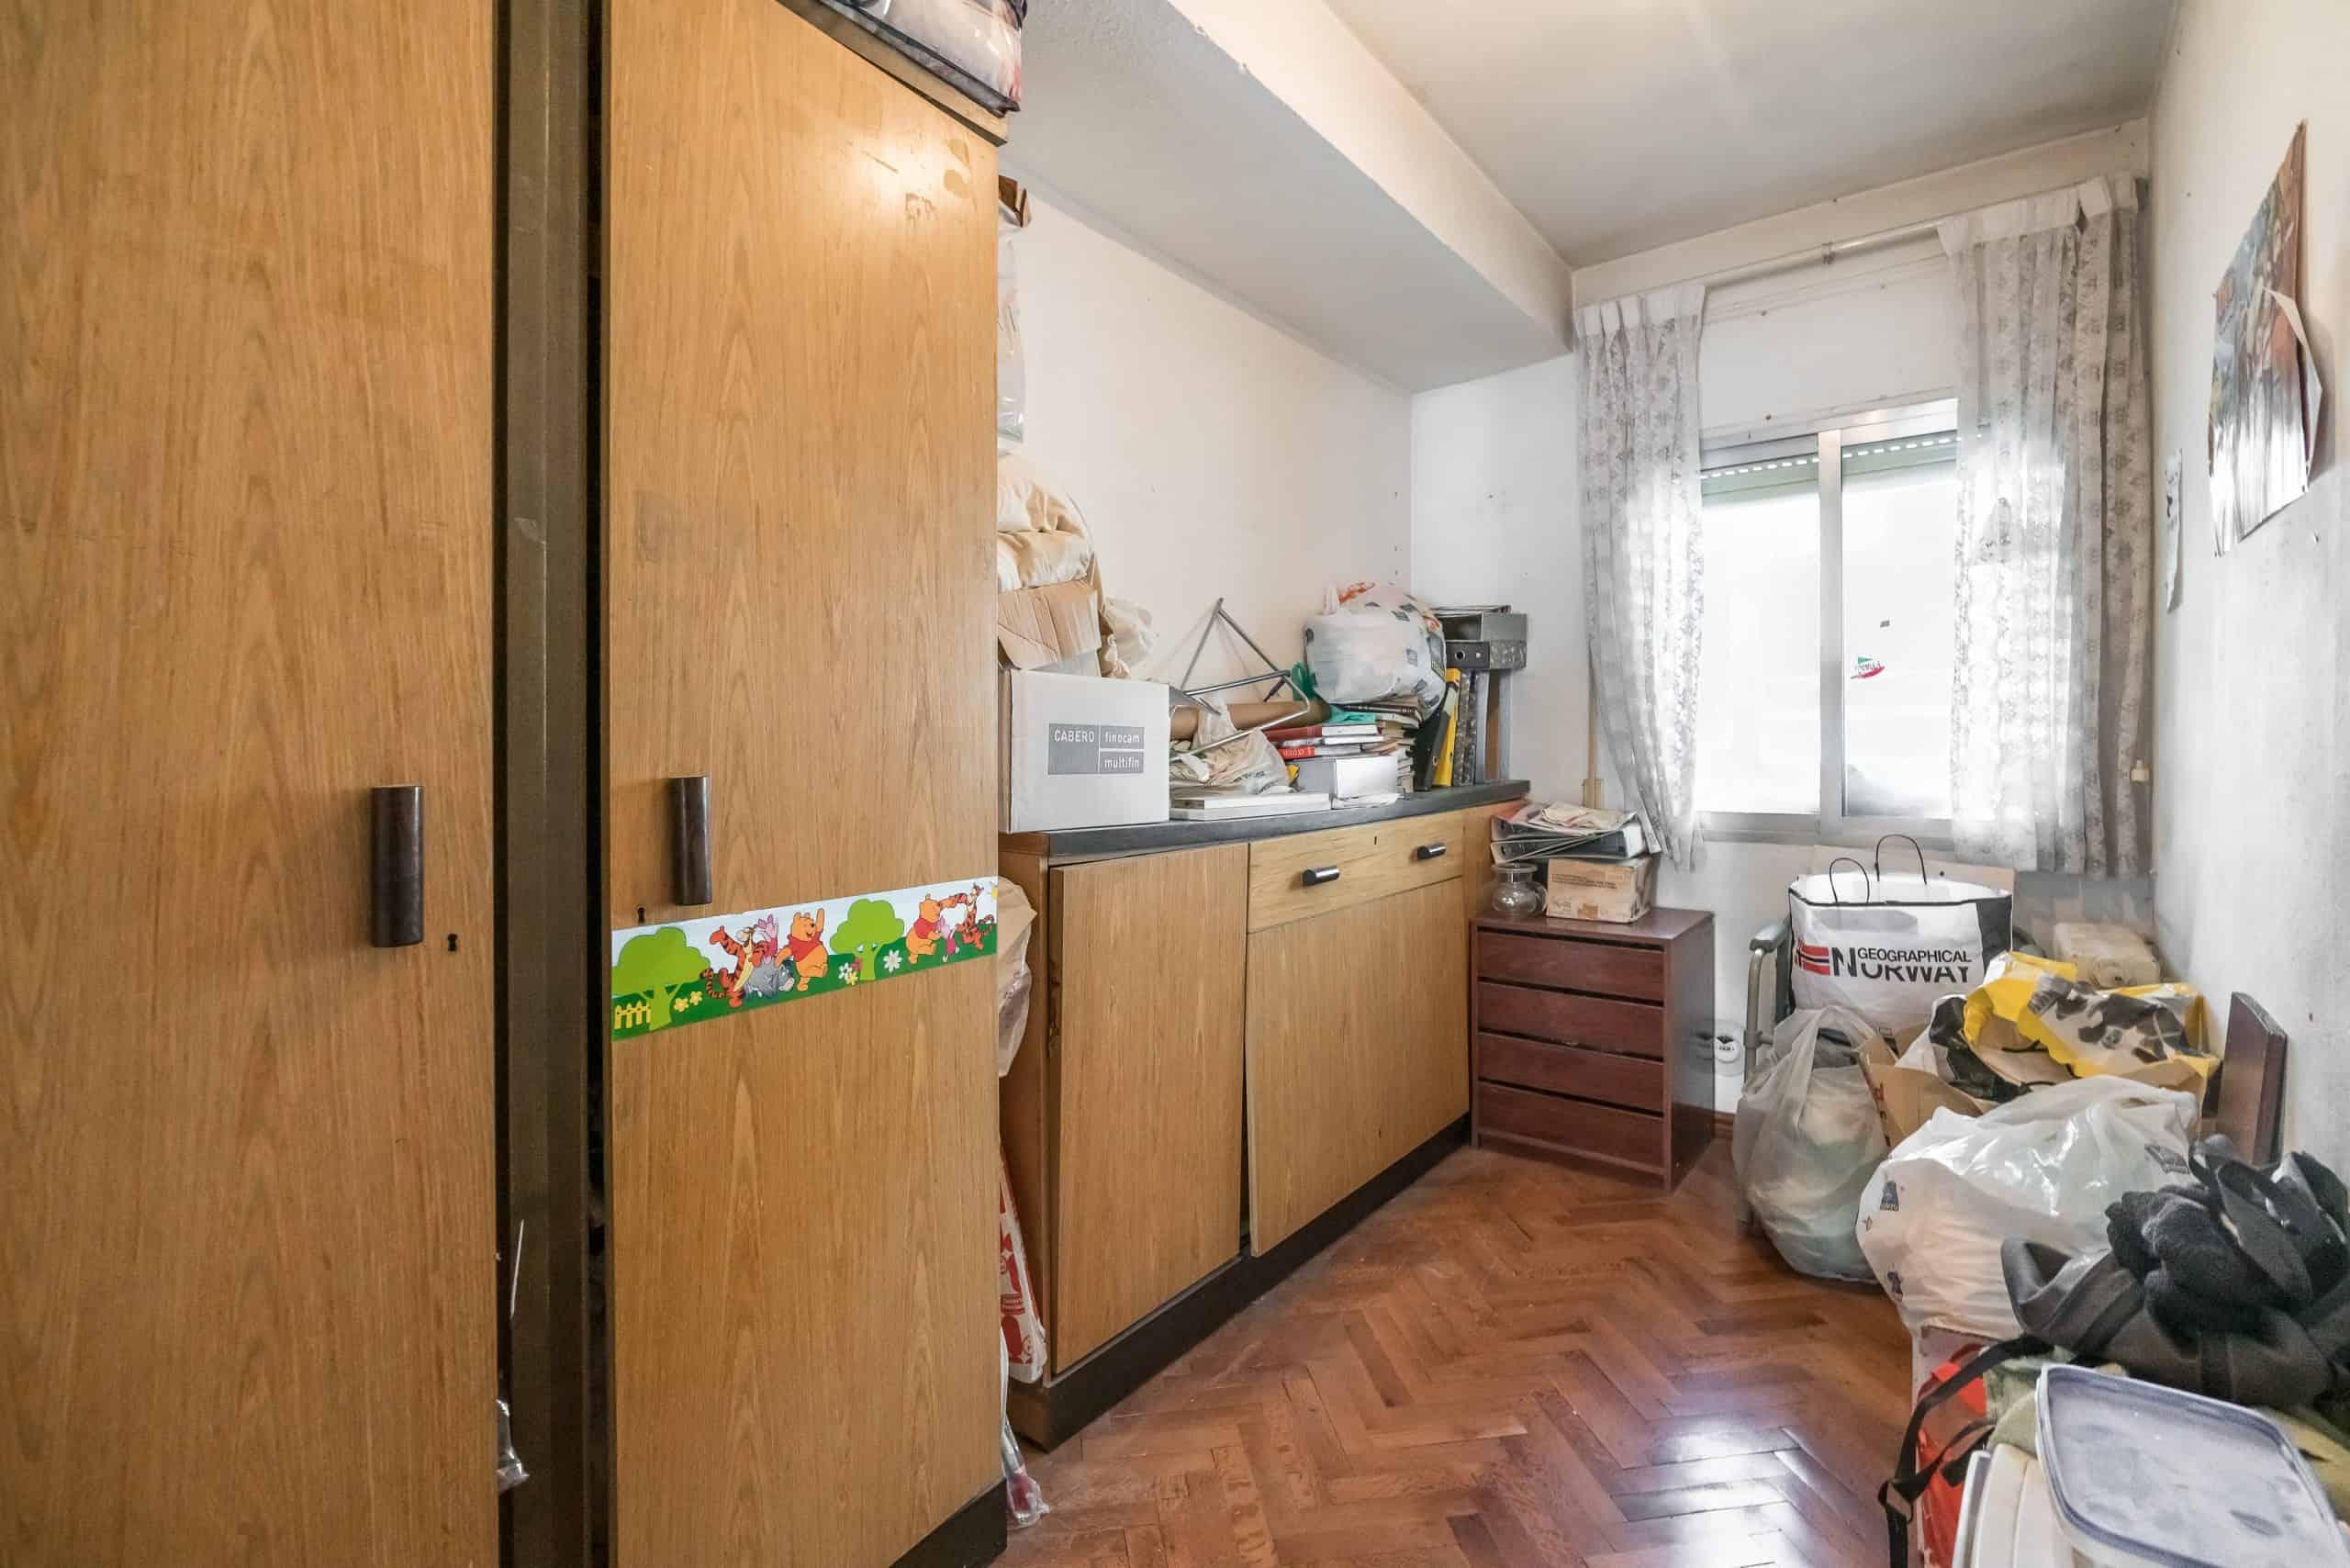 Agencia Inmobiliaria de Madrid-FUTUROCASA-calle Alcala- dormitorio3 1